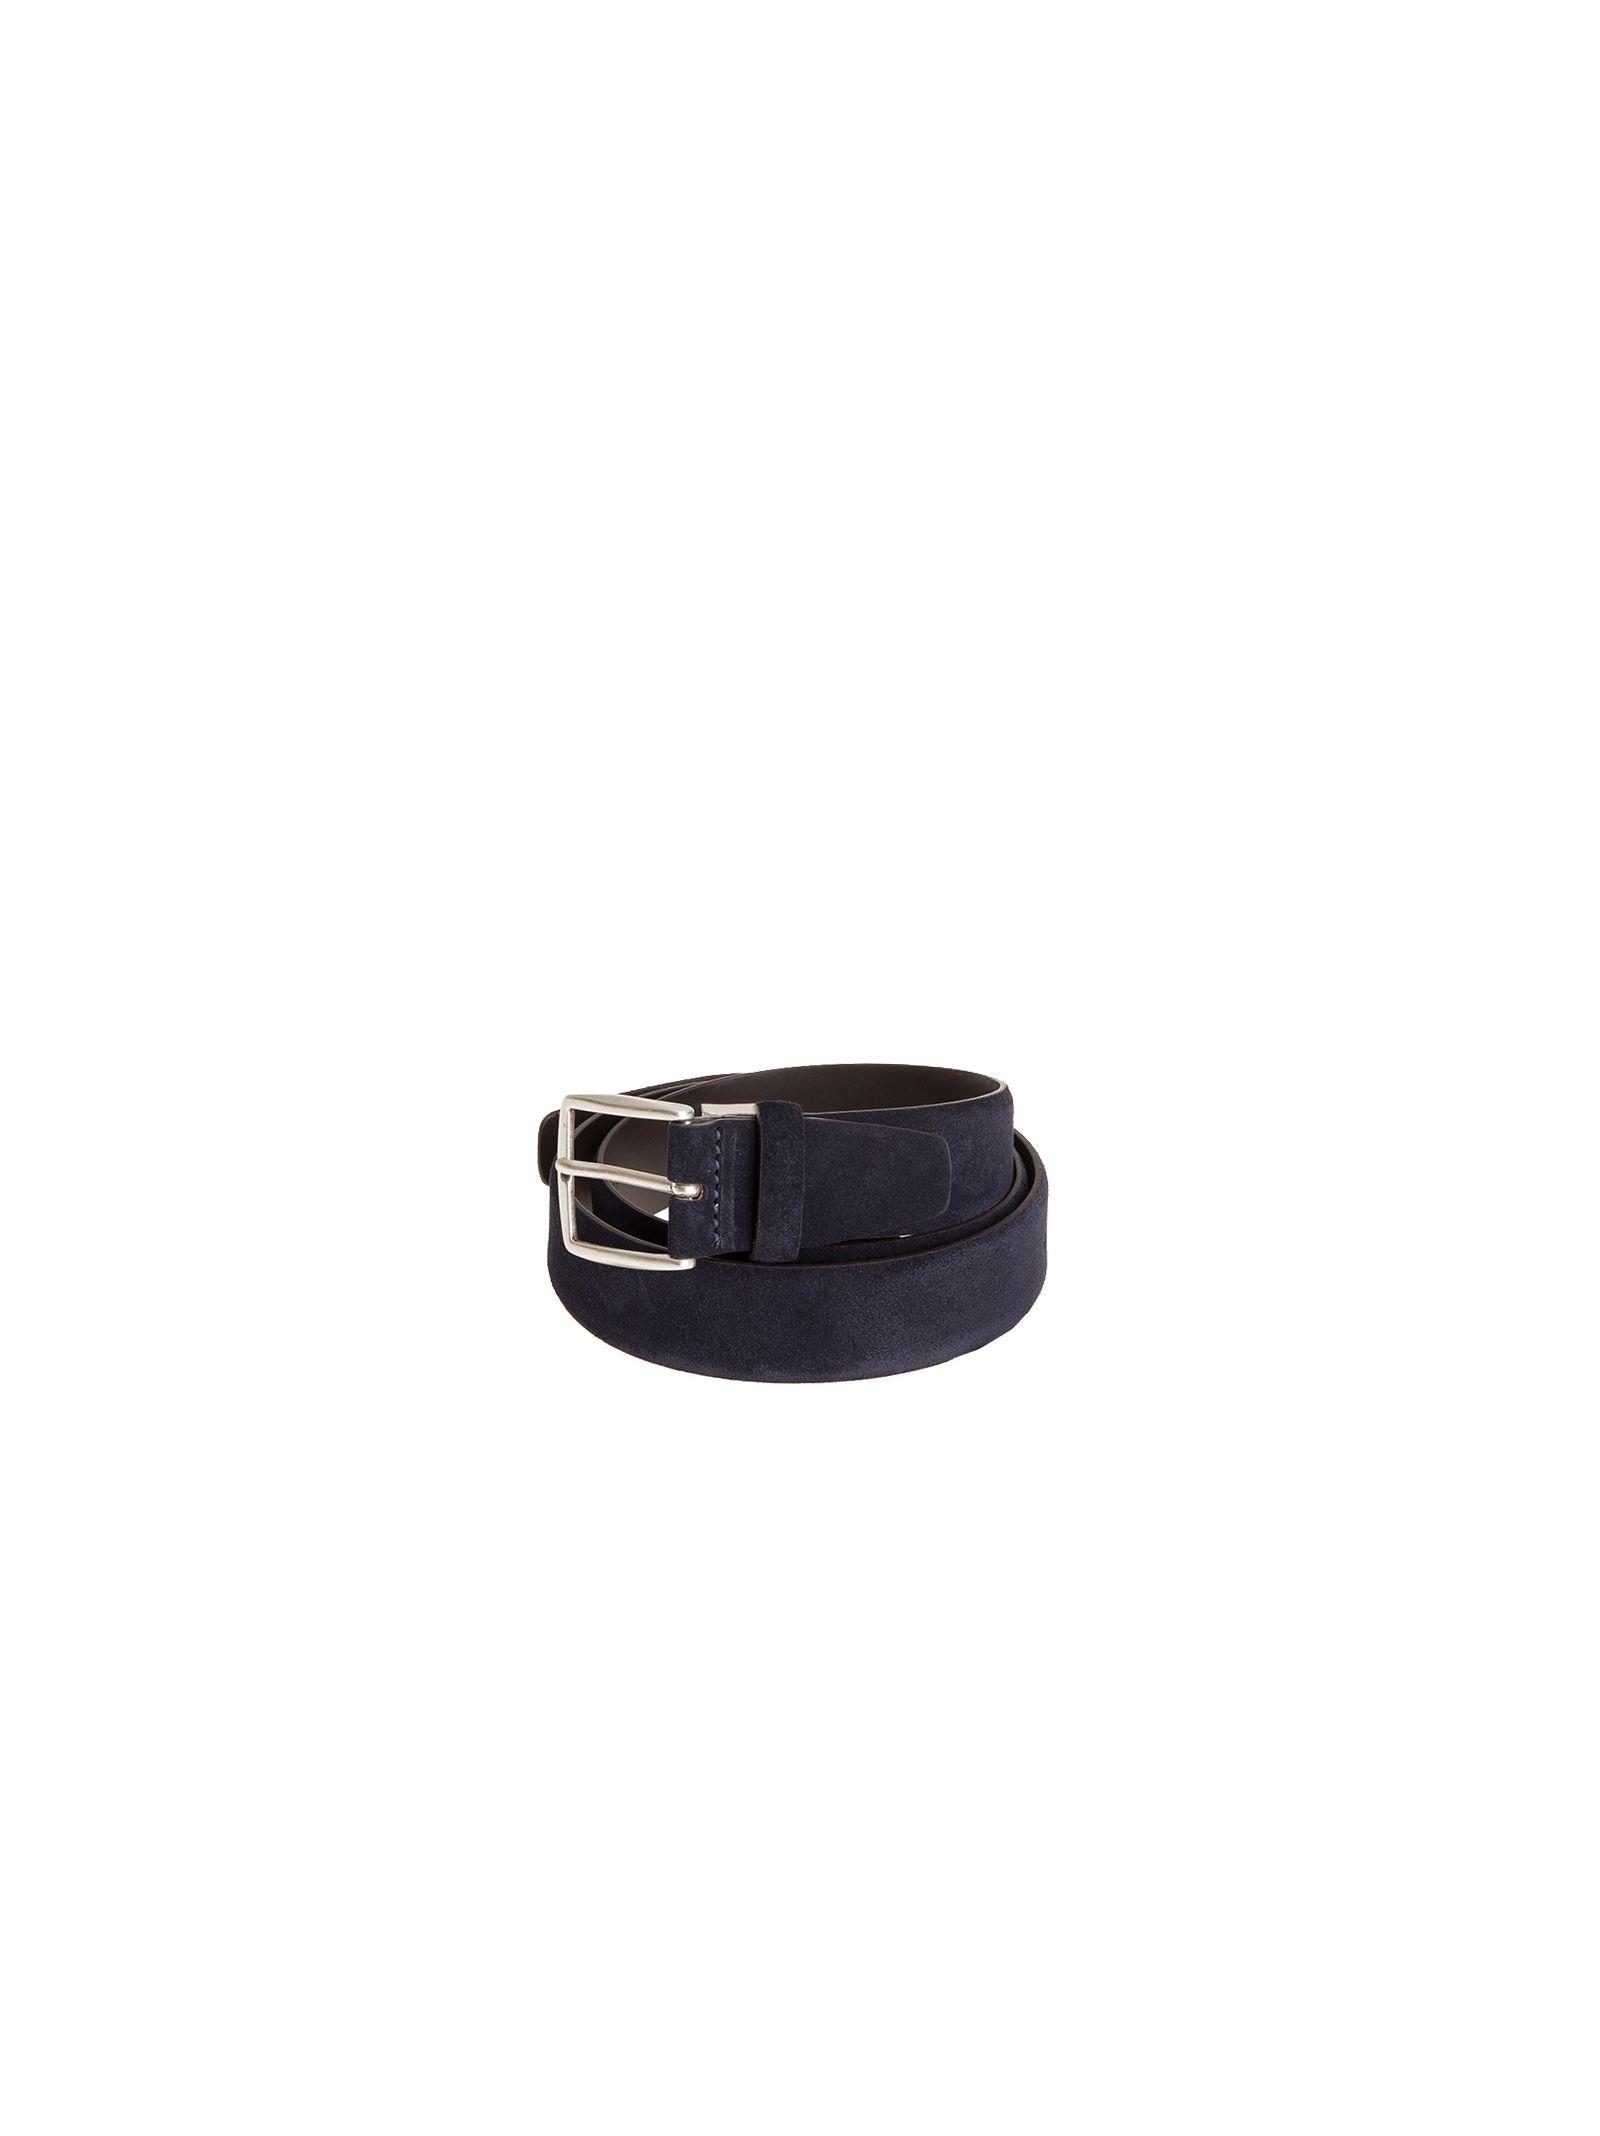 Leather Belt Andrea D'amico Acub056 539